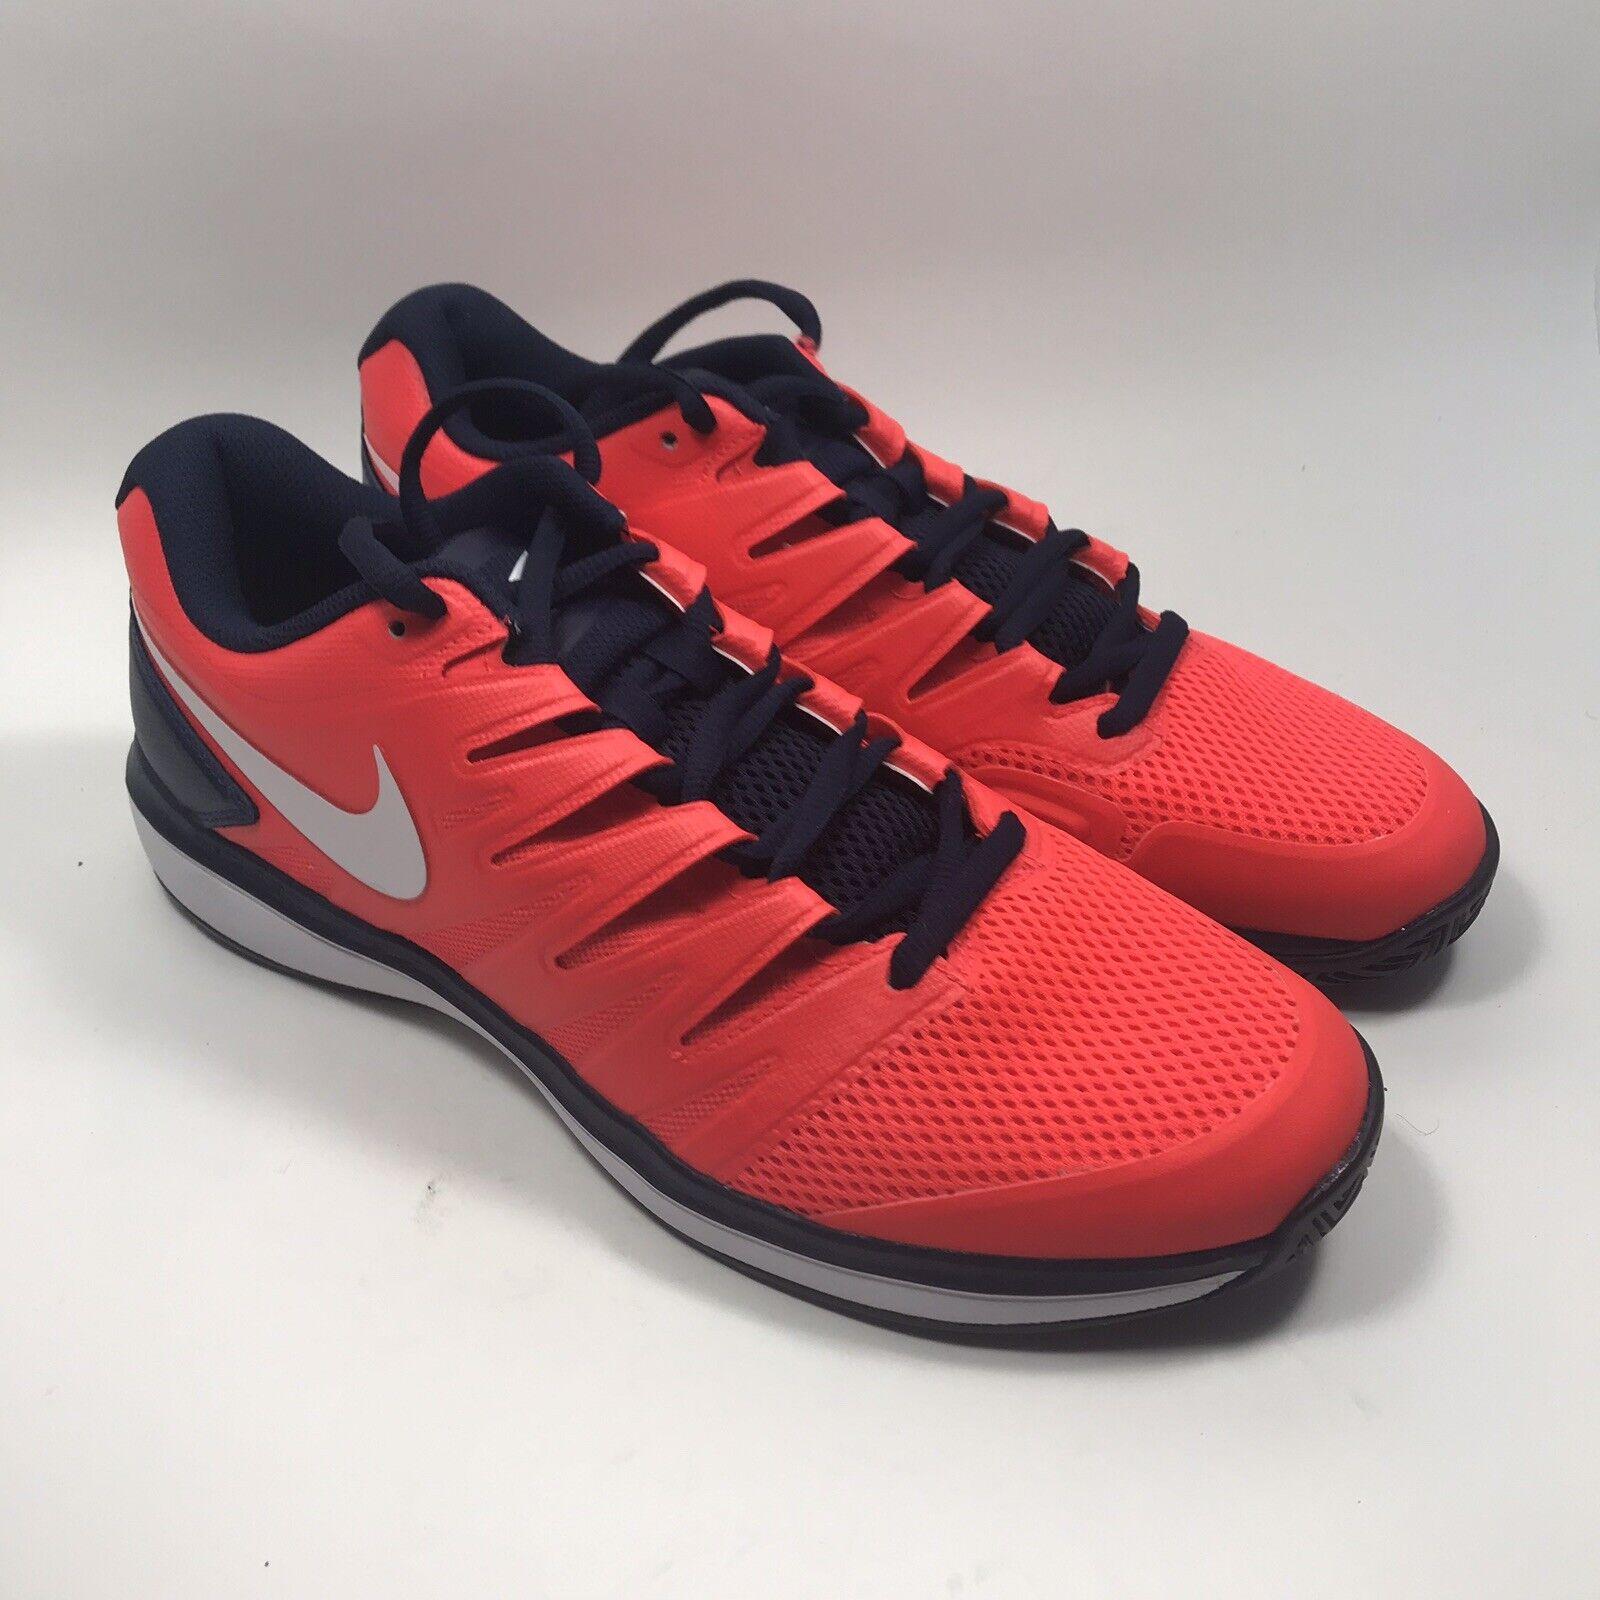 Nike Air Zoom Prestige Bright Crimson Tennis shoes AA8020 614 Men's Size 11.5